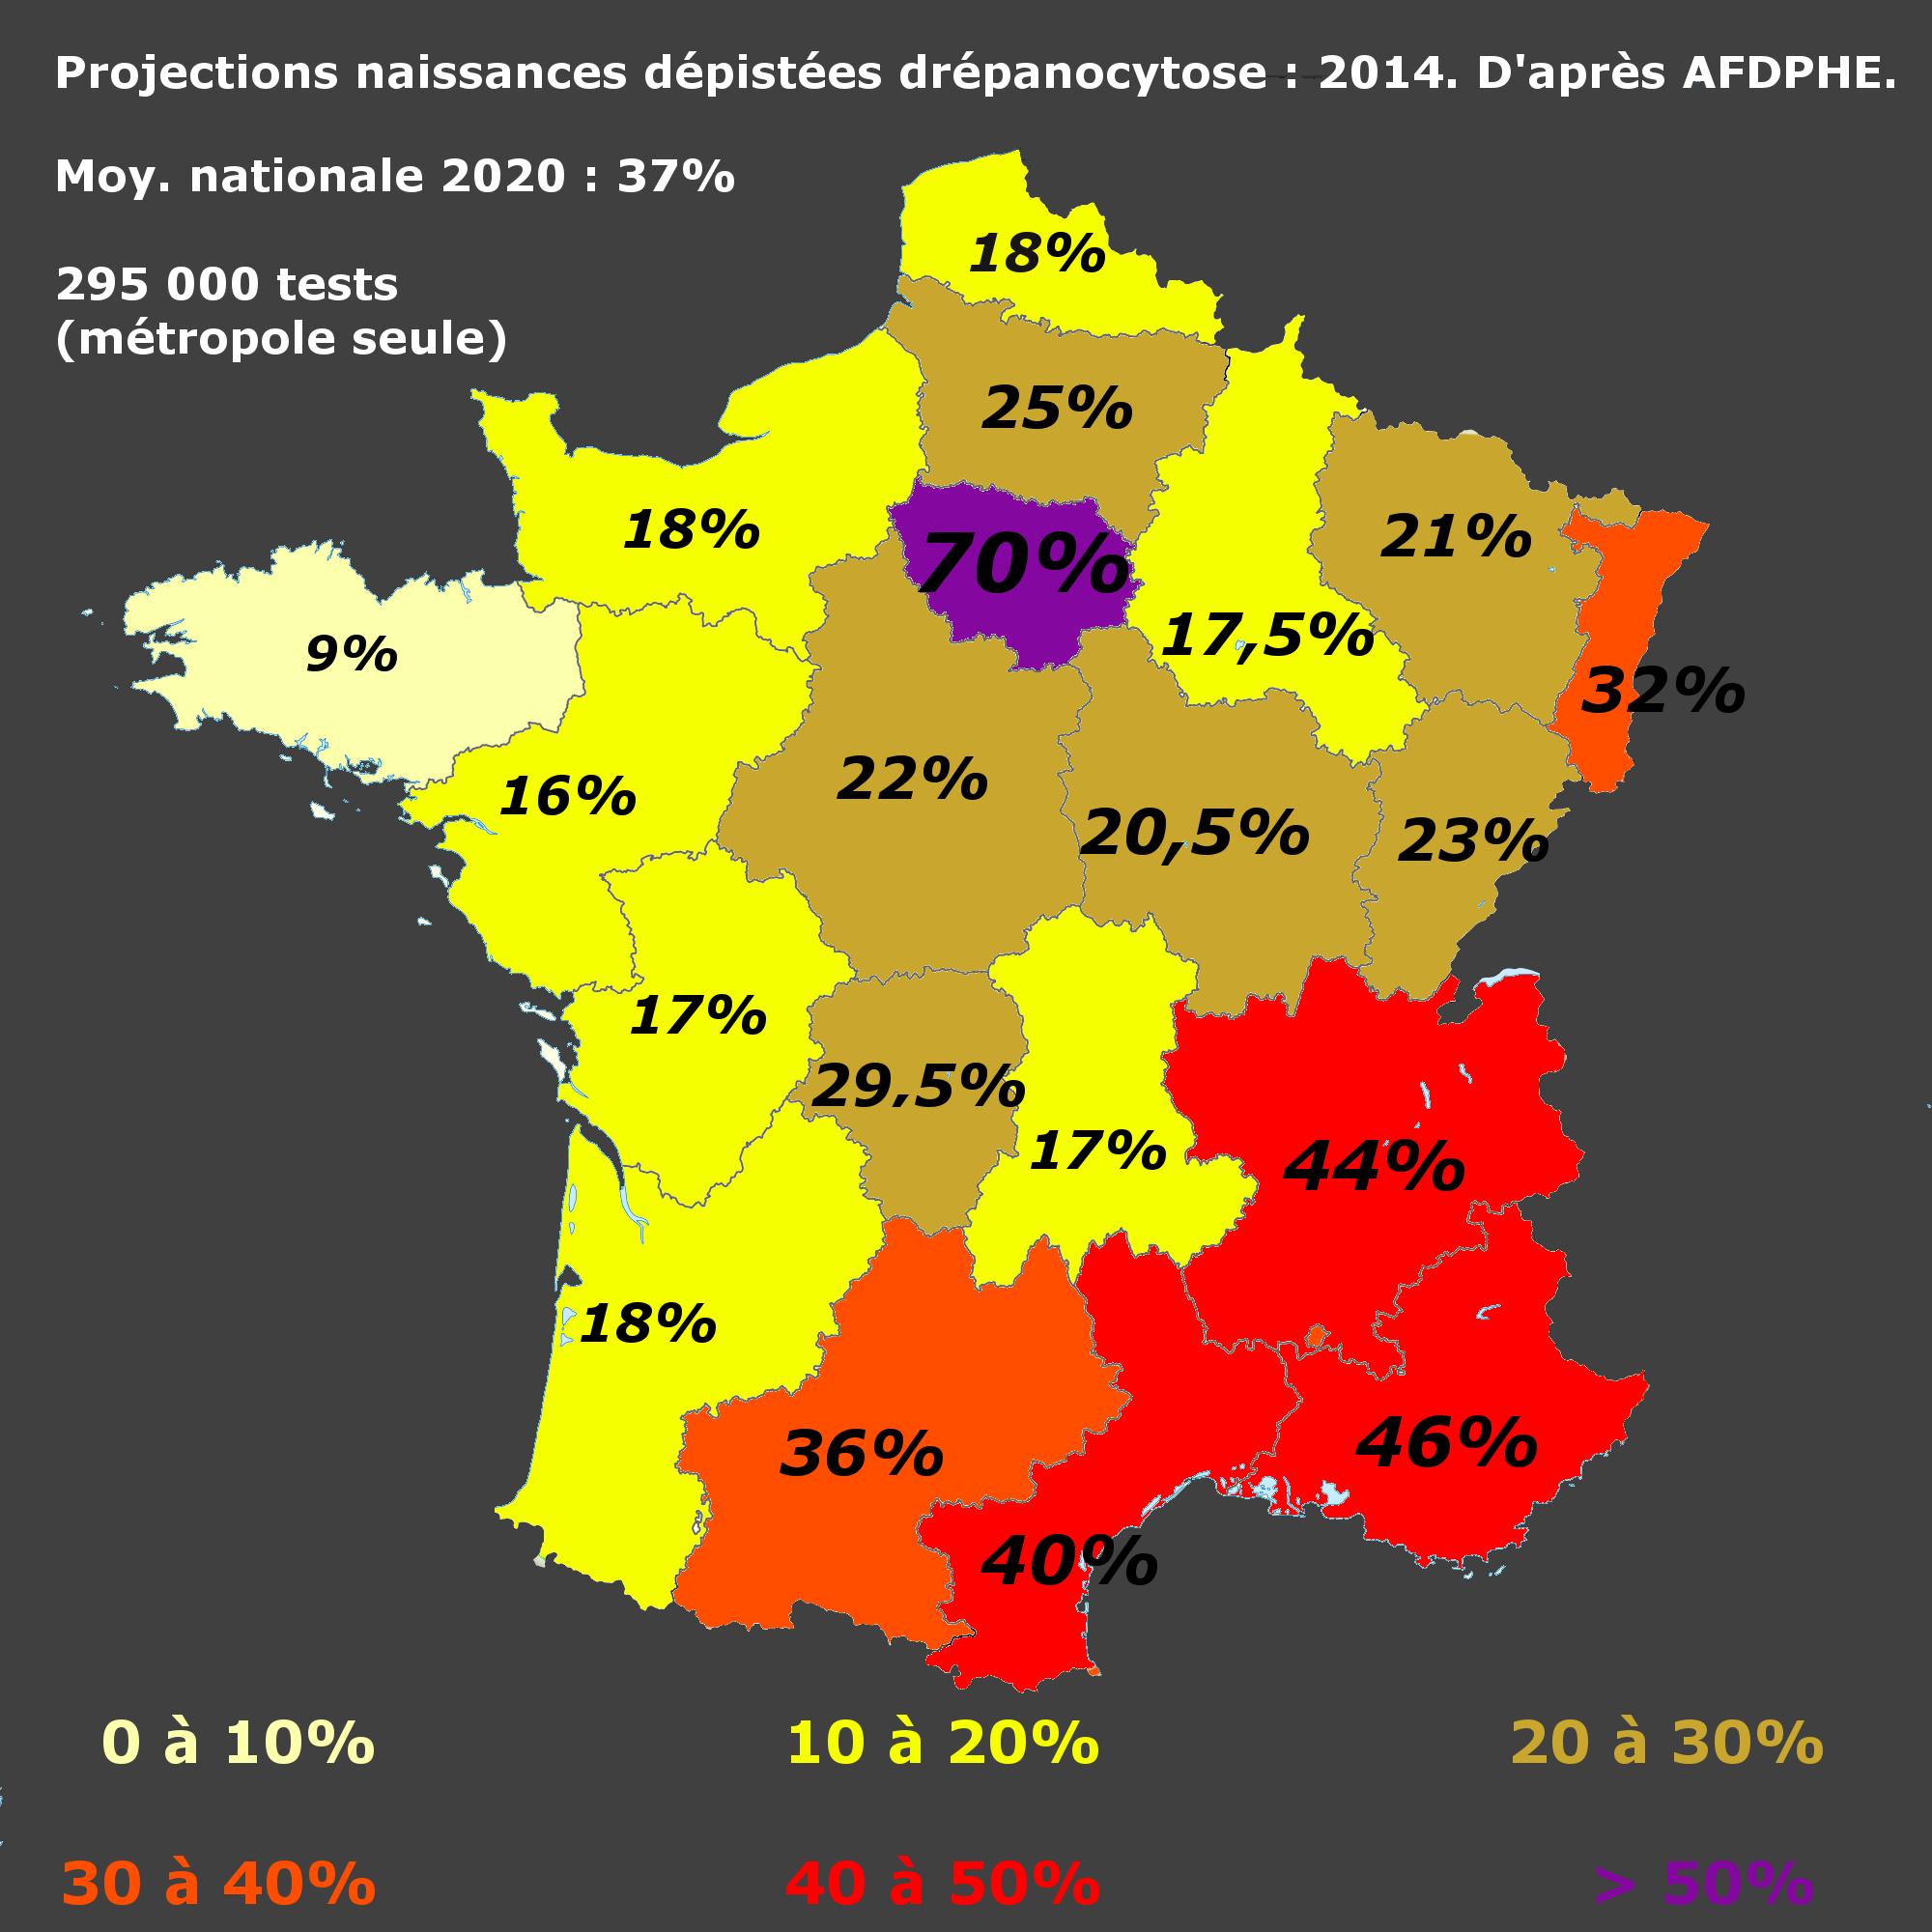 [Image: france_regions_drepano_2014proj.png]